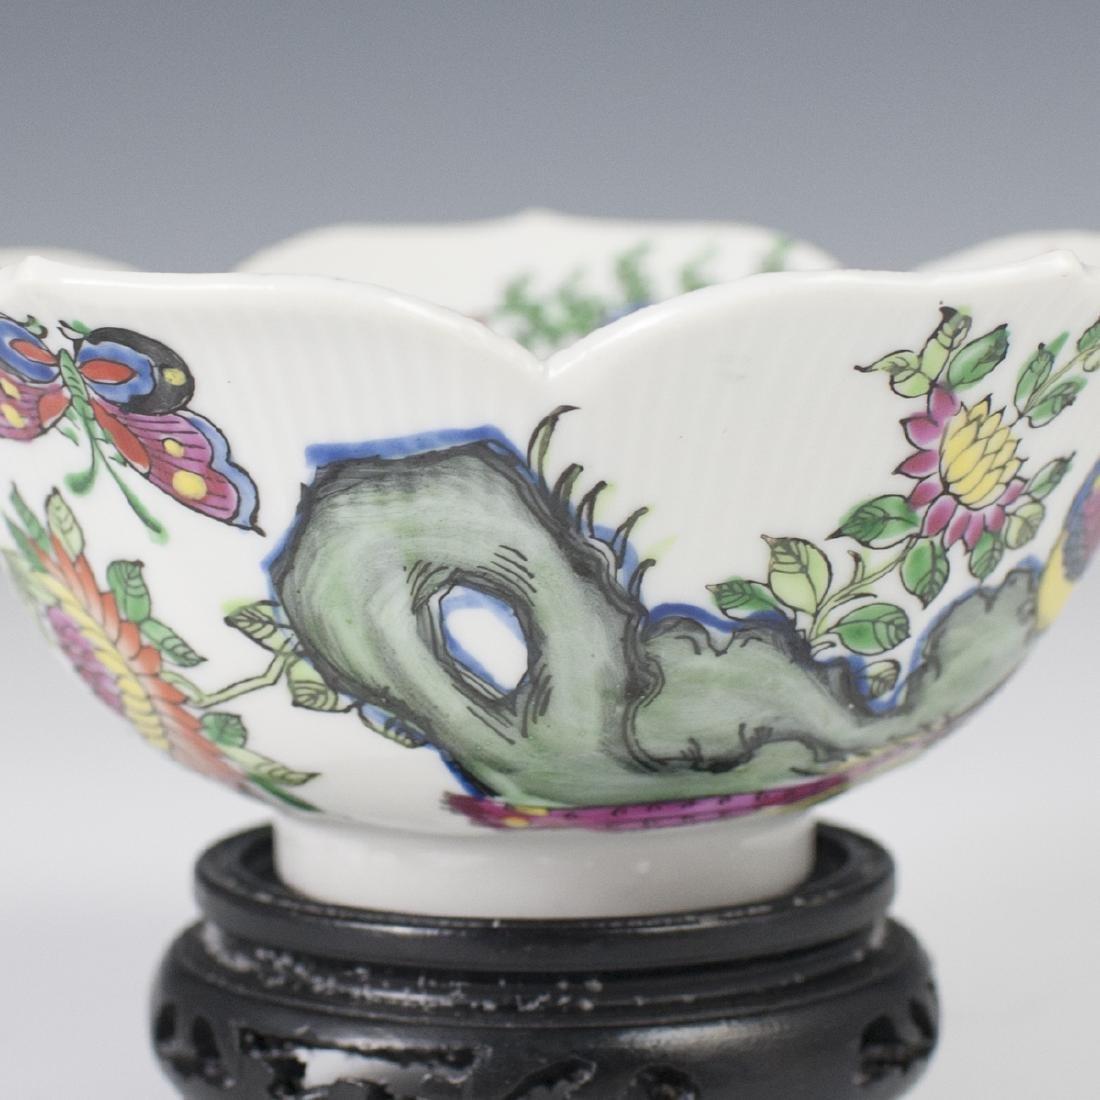 Oriental Objects D'Art Porcelain Bowl - 2